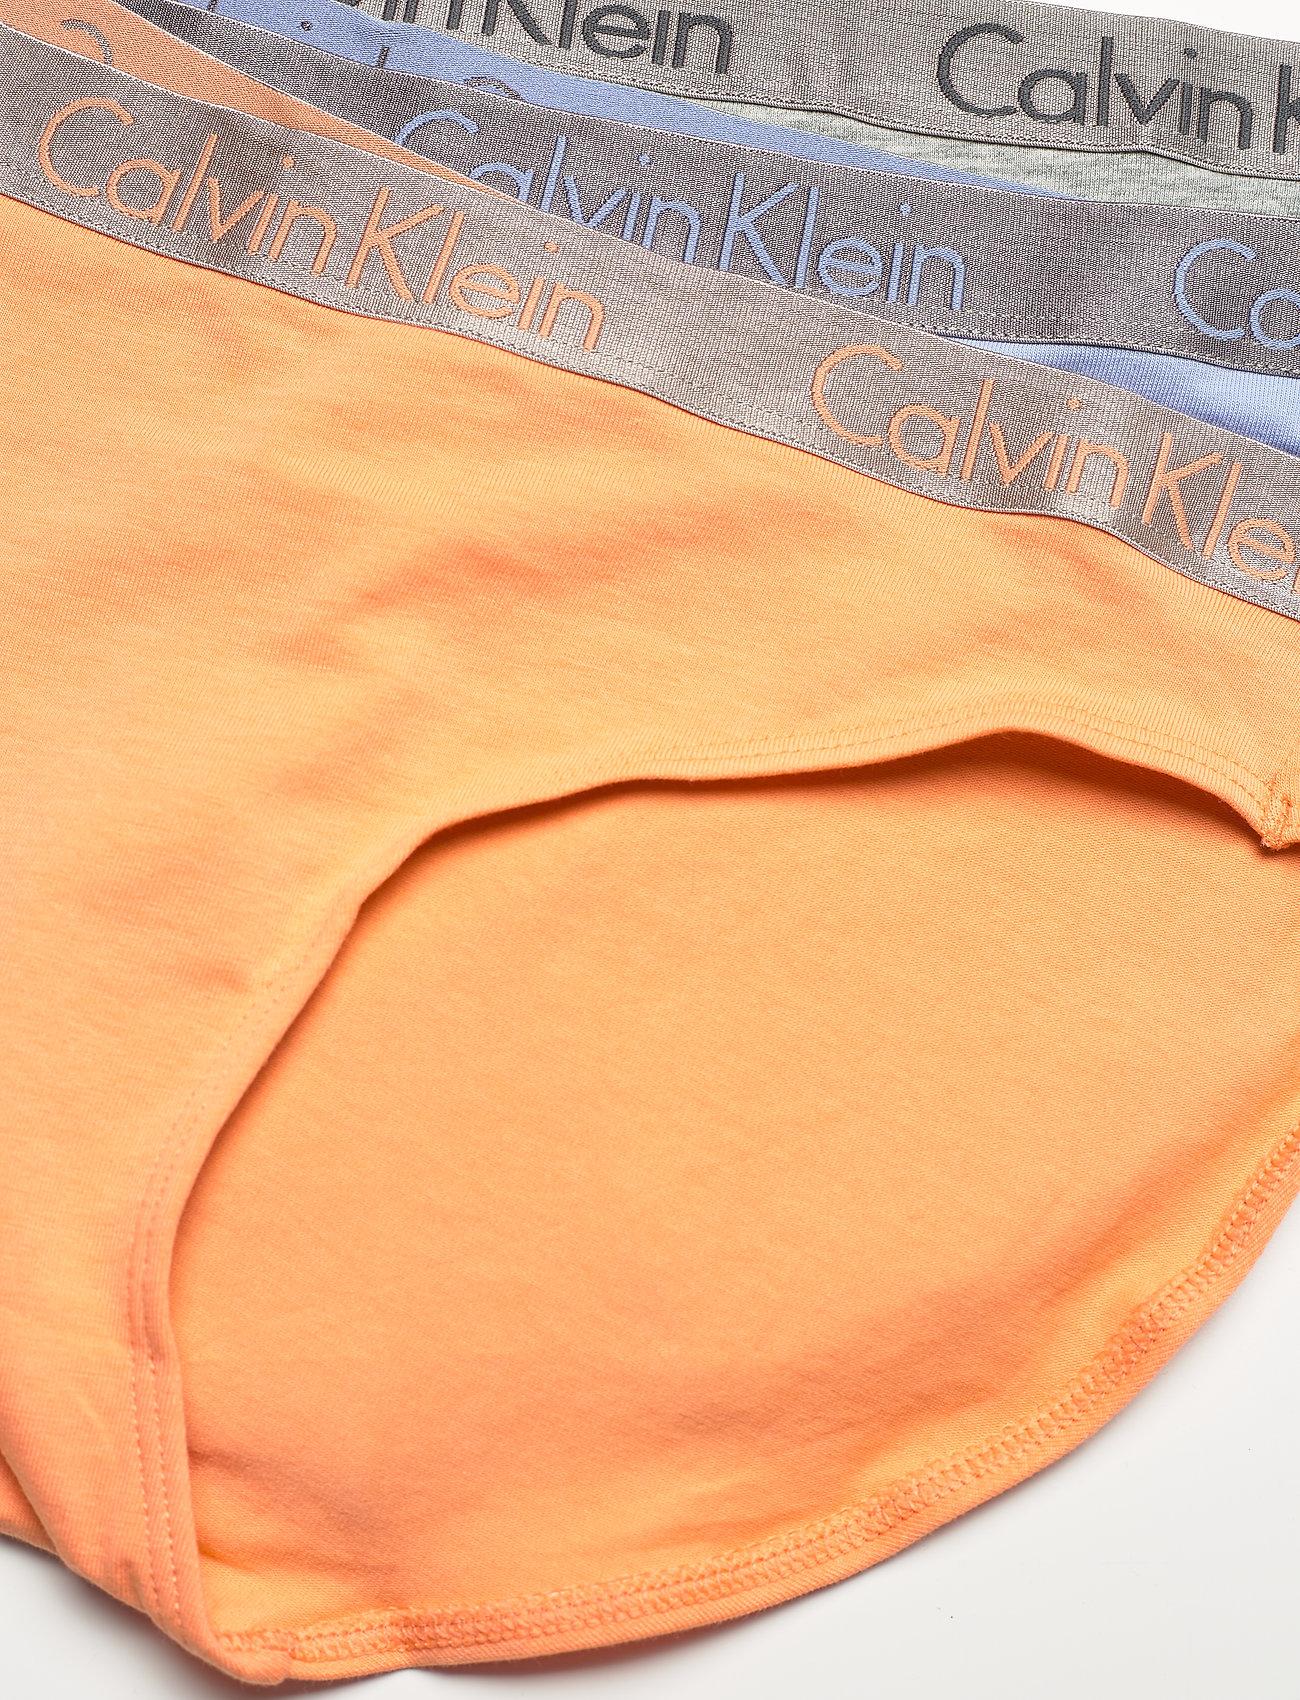 Calvin Klein - BIKINI 3PK - majtki - grey heather/pale blue/flambe - 1